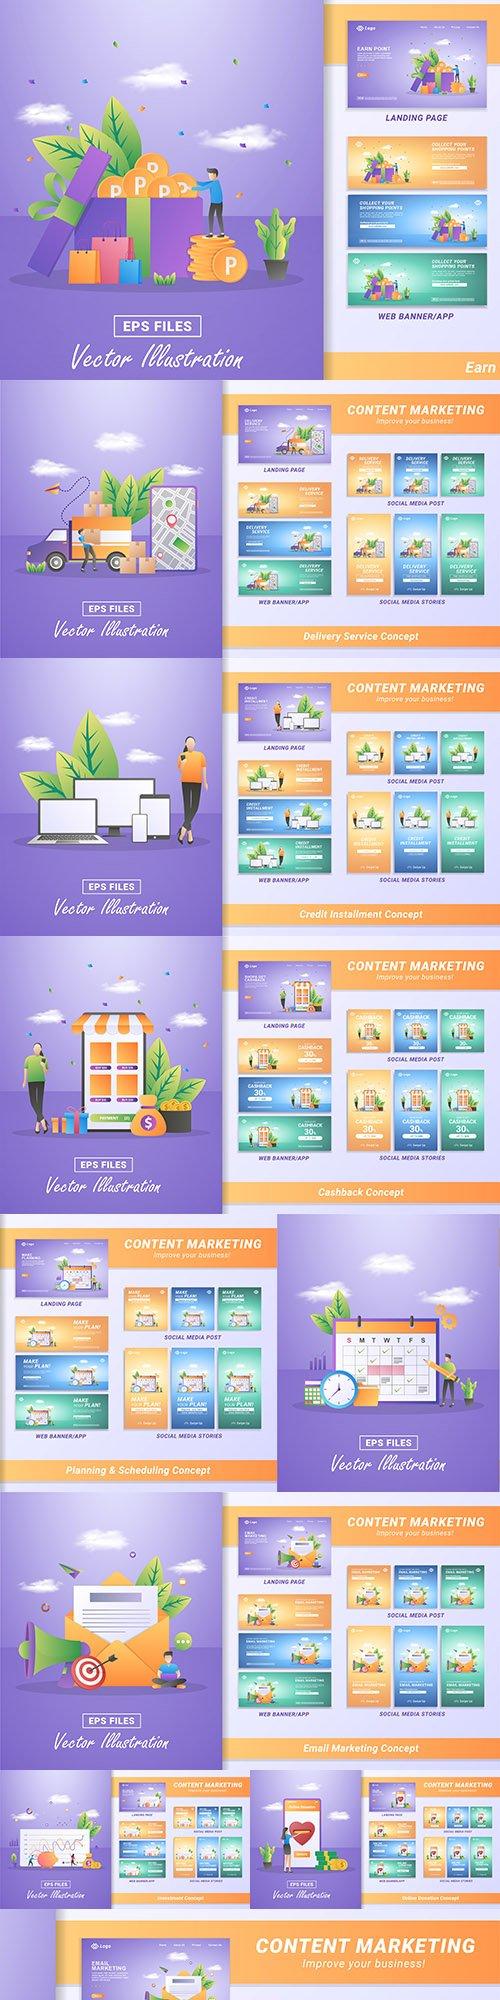 Online marketing content material design flat banner